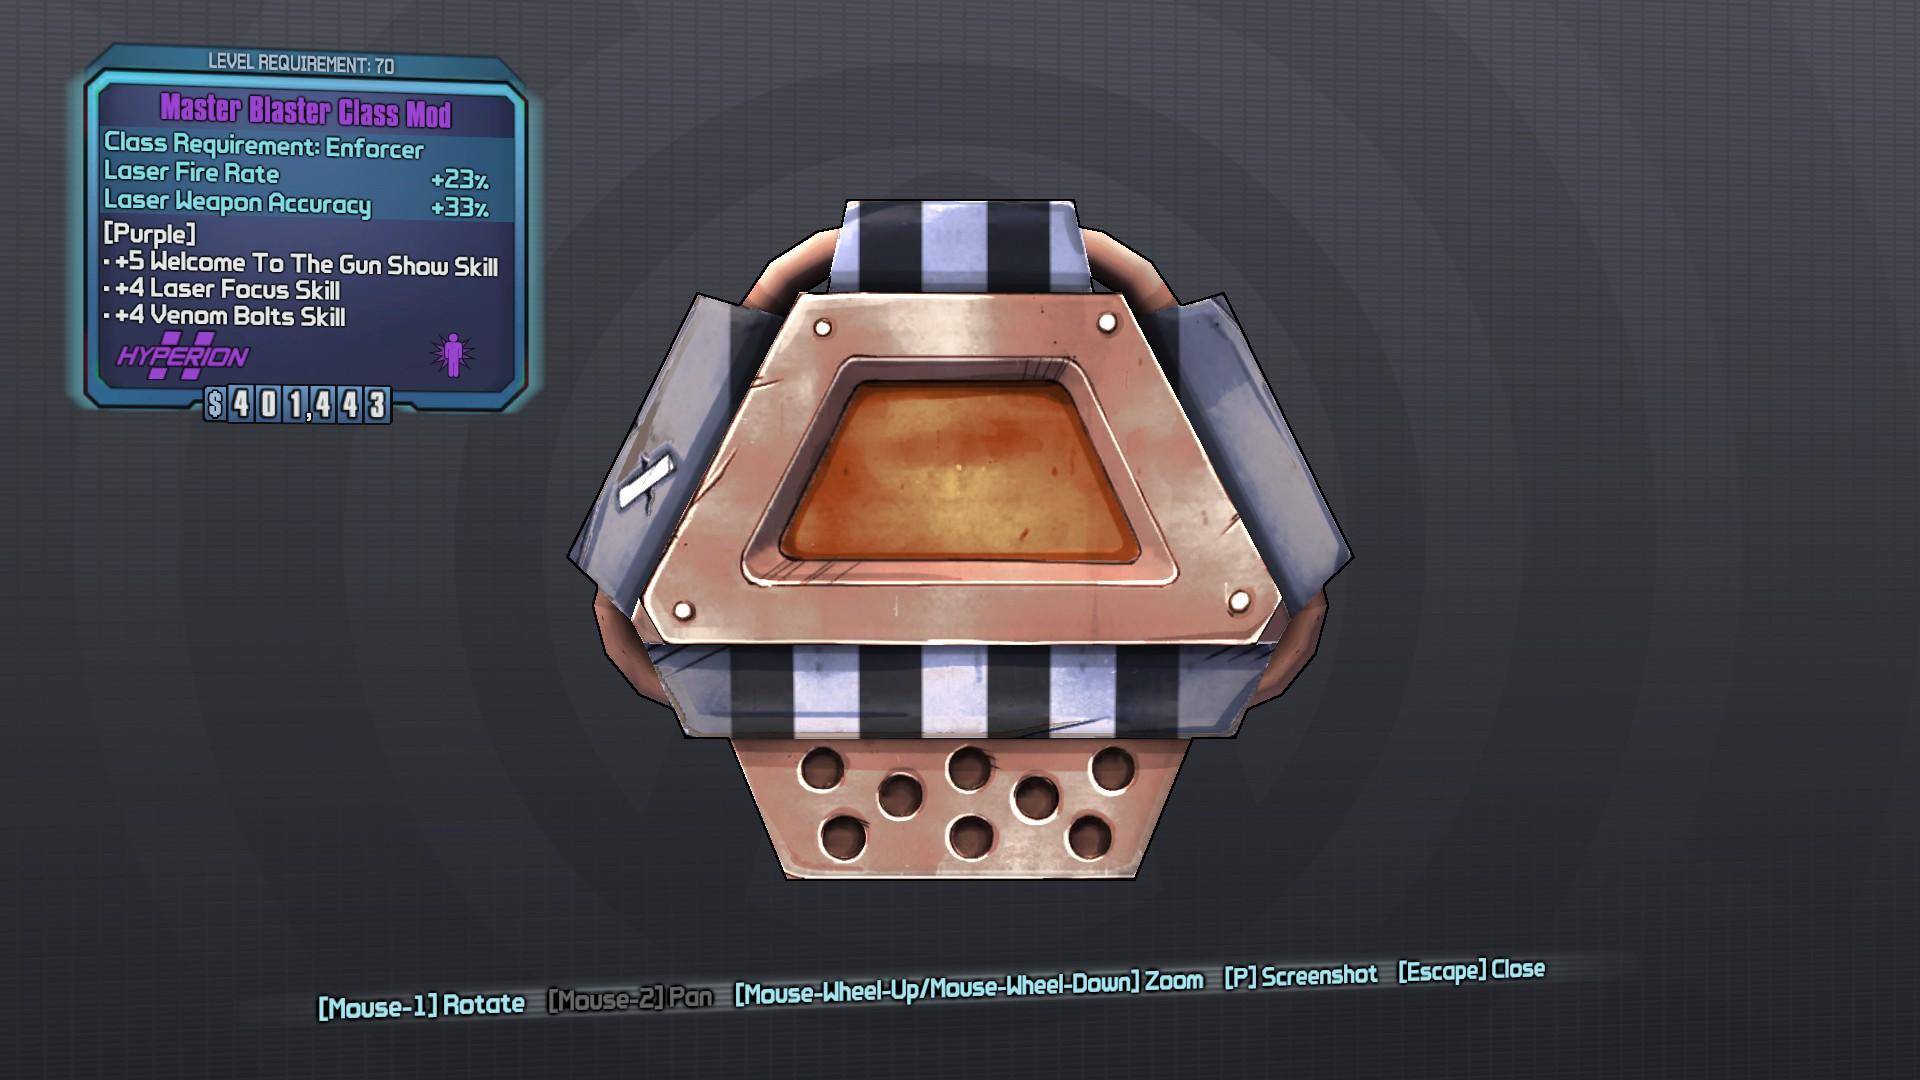 Blaster (class mod)